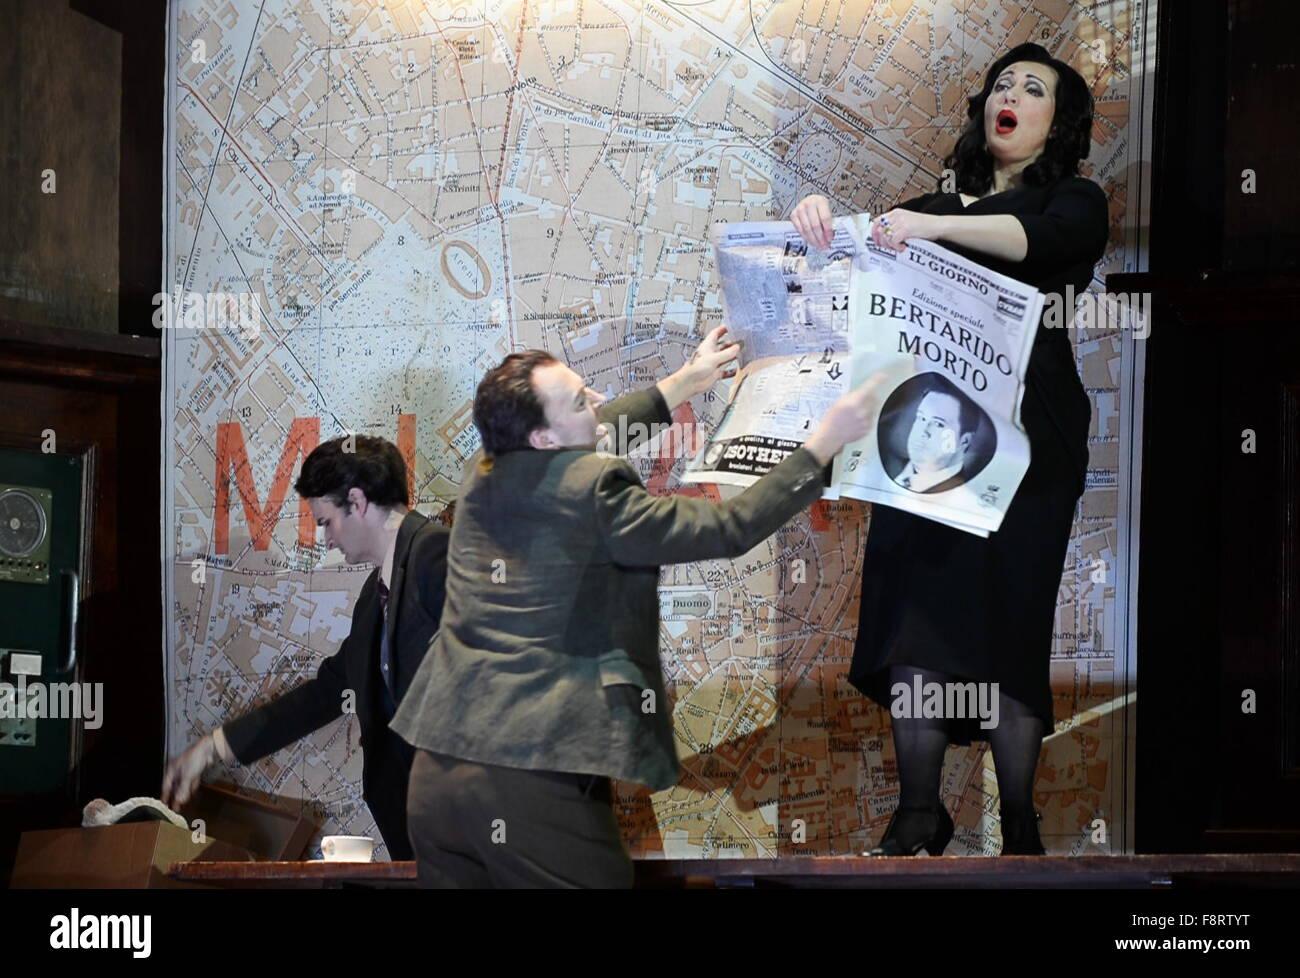 Moscow, Russia. 11th Dec, 2015. Soprano Dina Kuznetsova (R) as Rodelinda in a scene from Handel's Rodelinda - Stock Image